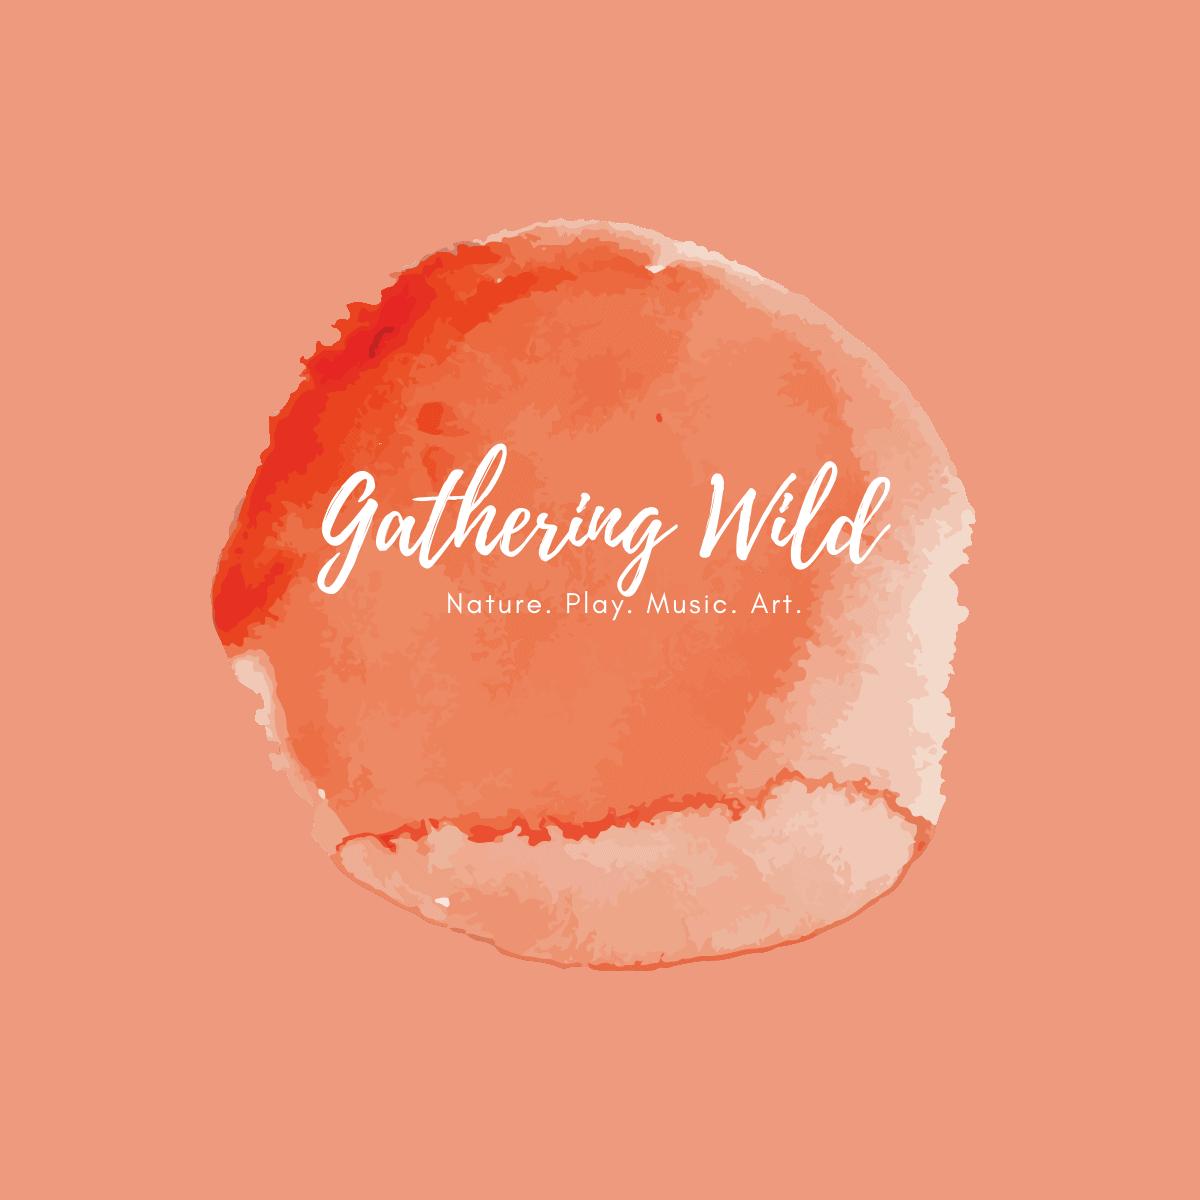 Gathering Wild